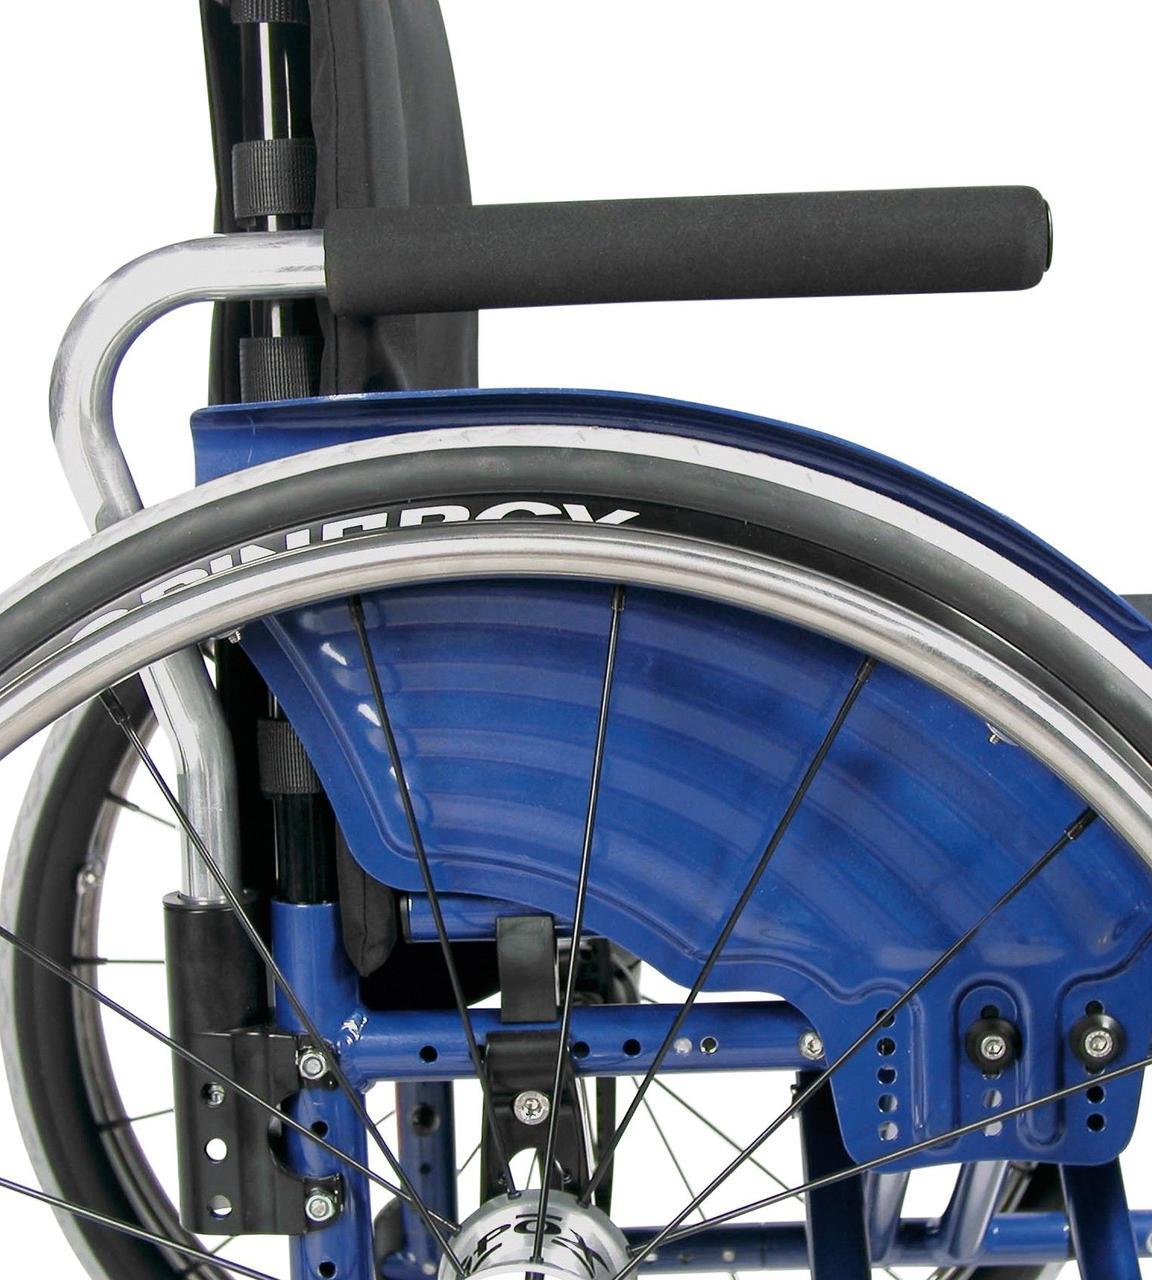 Кресло-коляска Otto Bock АВАНГАРД ТИН активного типа для детей и подростков - фото 9